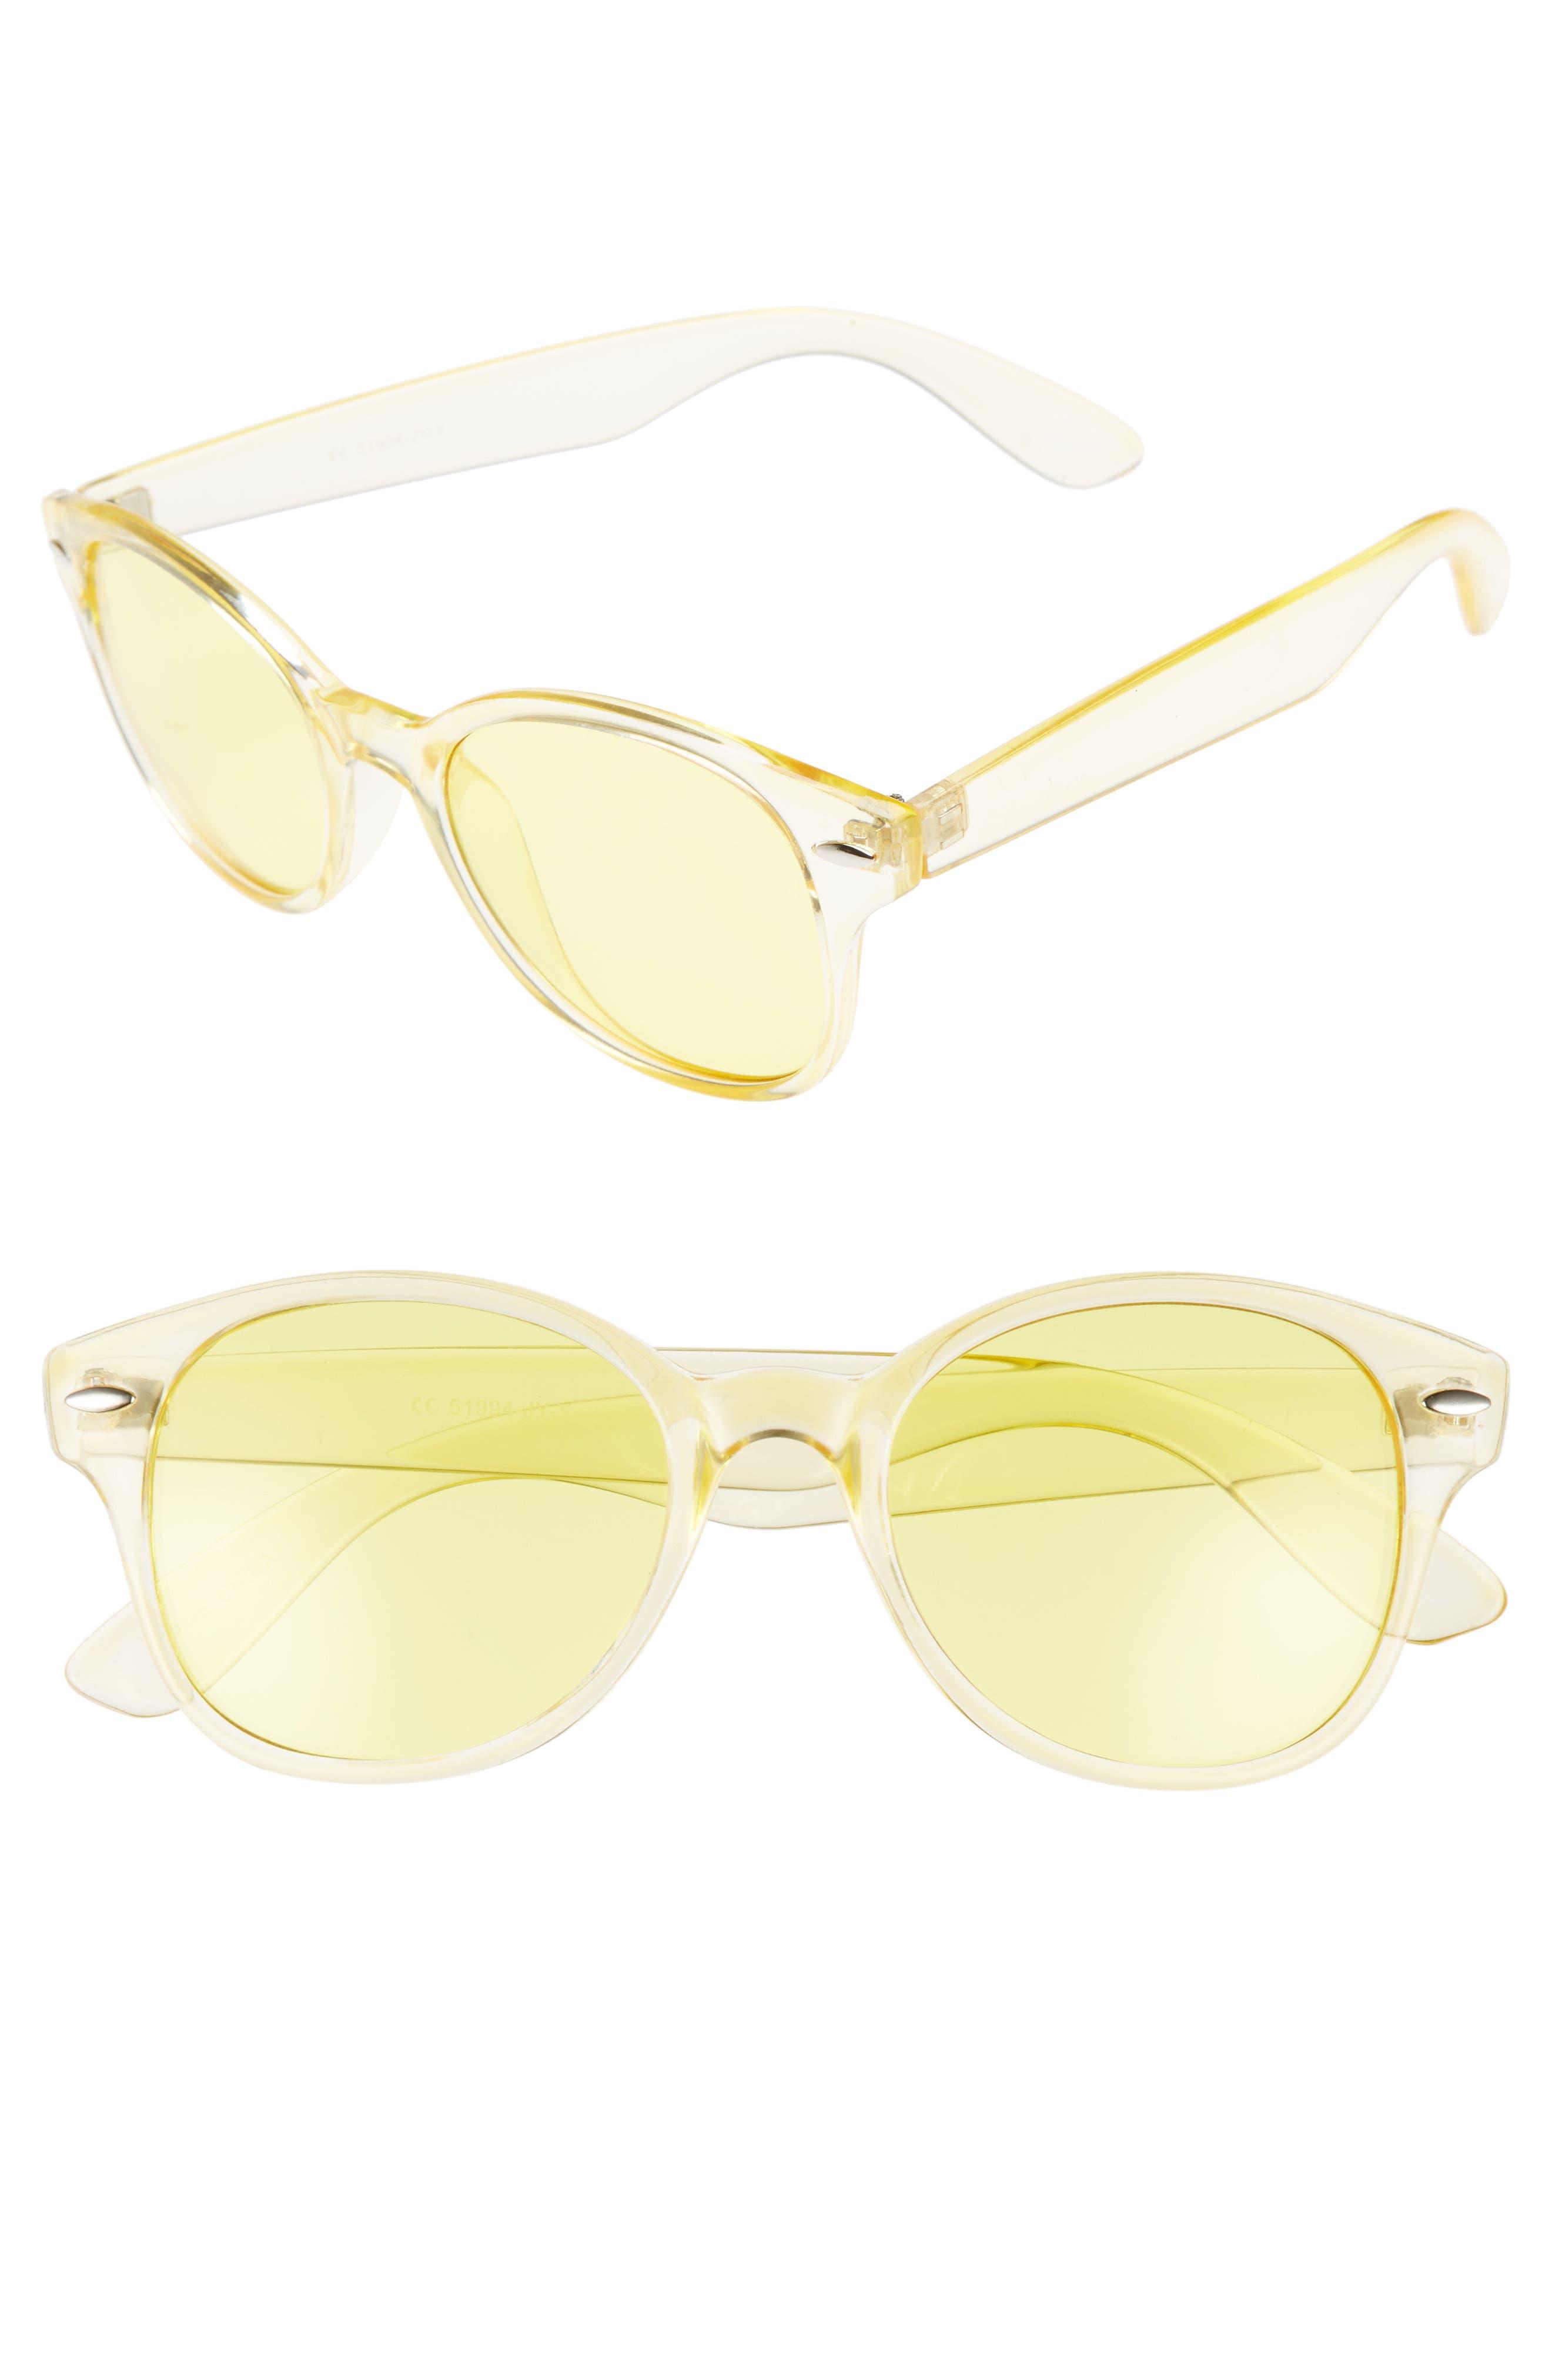 50mm Transparent Round Sunglasses,                         Main,                         color,